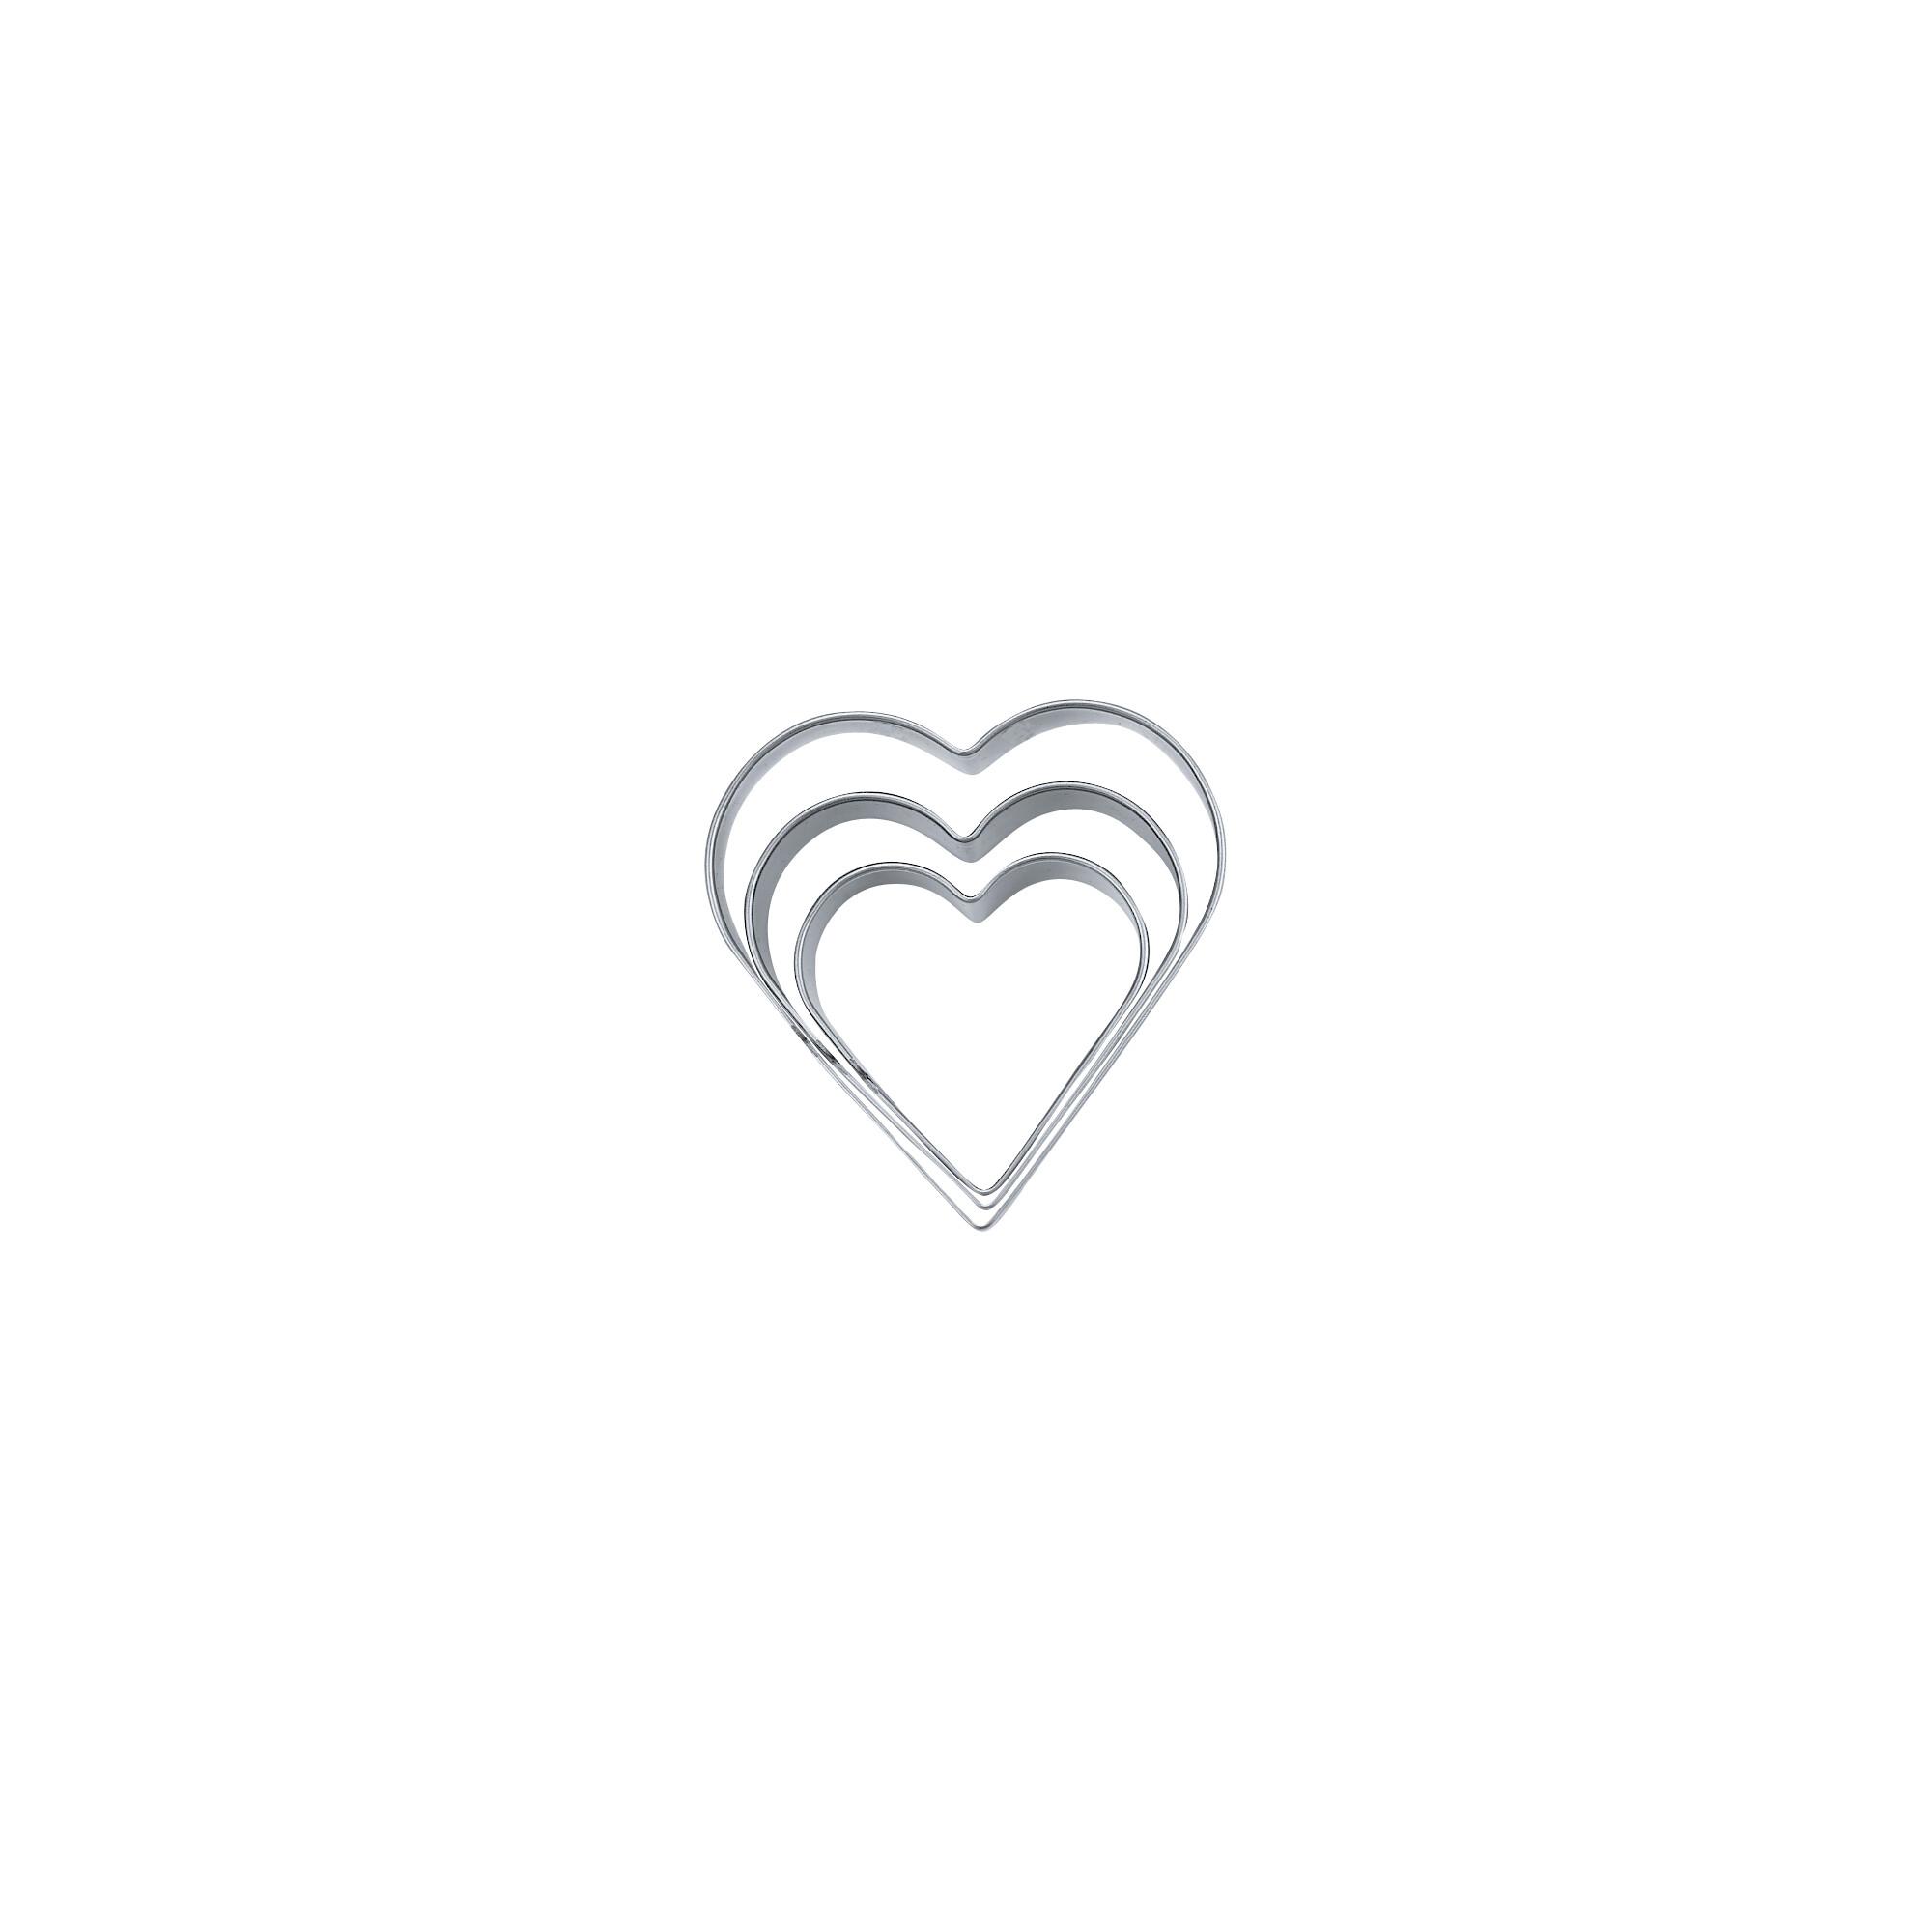 Heart - smooth - Set 3 parts